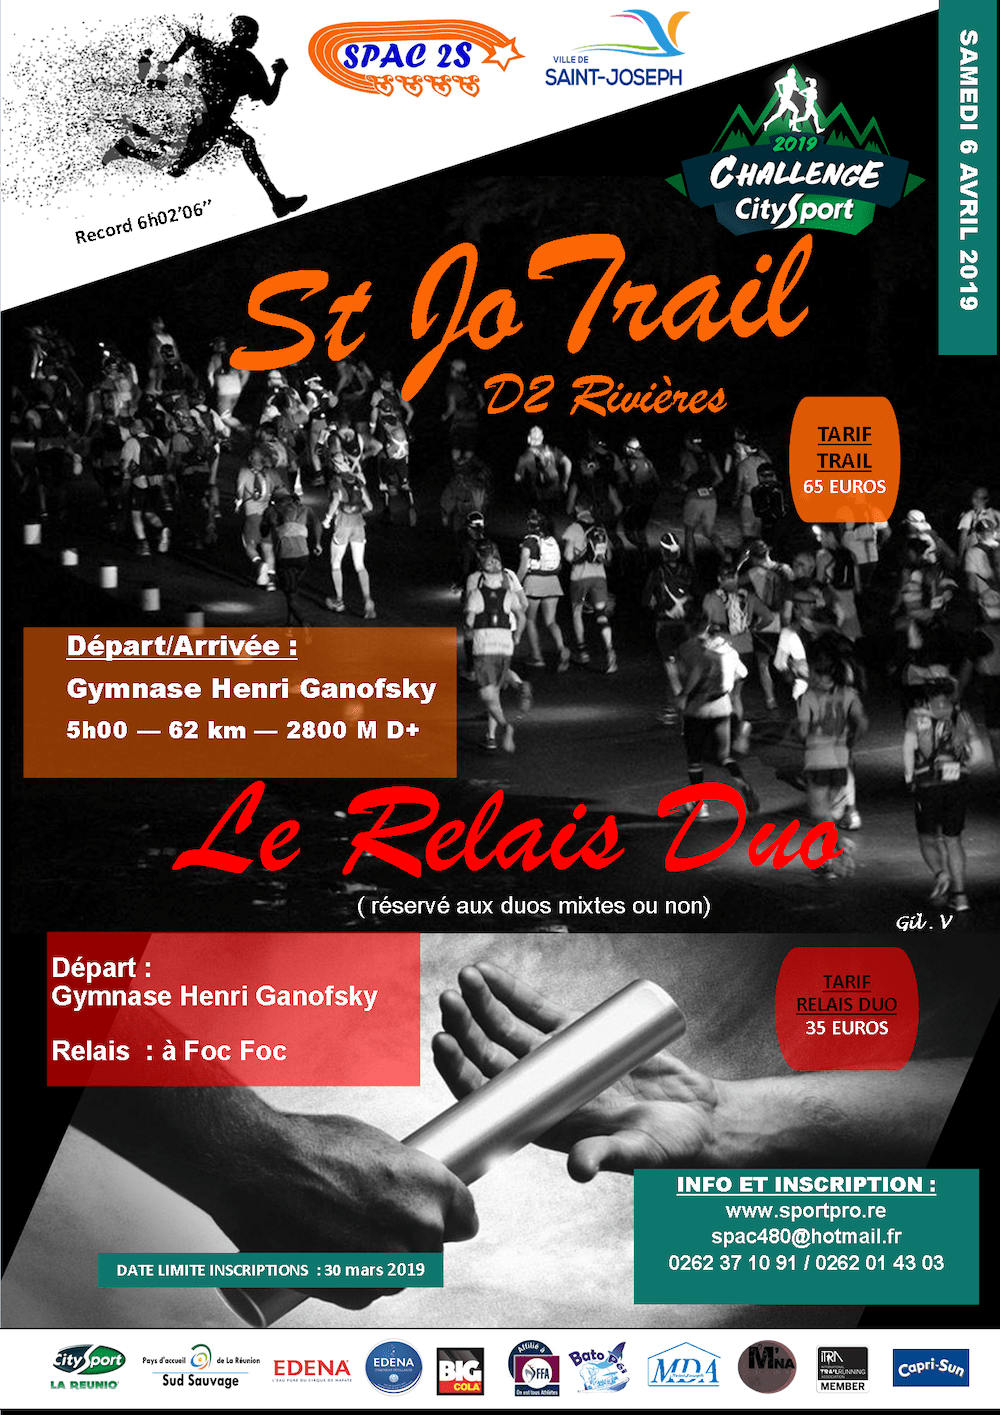 Affiche-St-Jo-Trail-2-Rivieres-2019